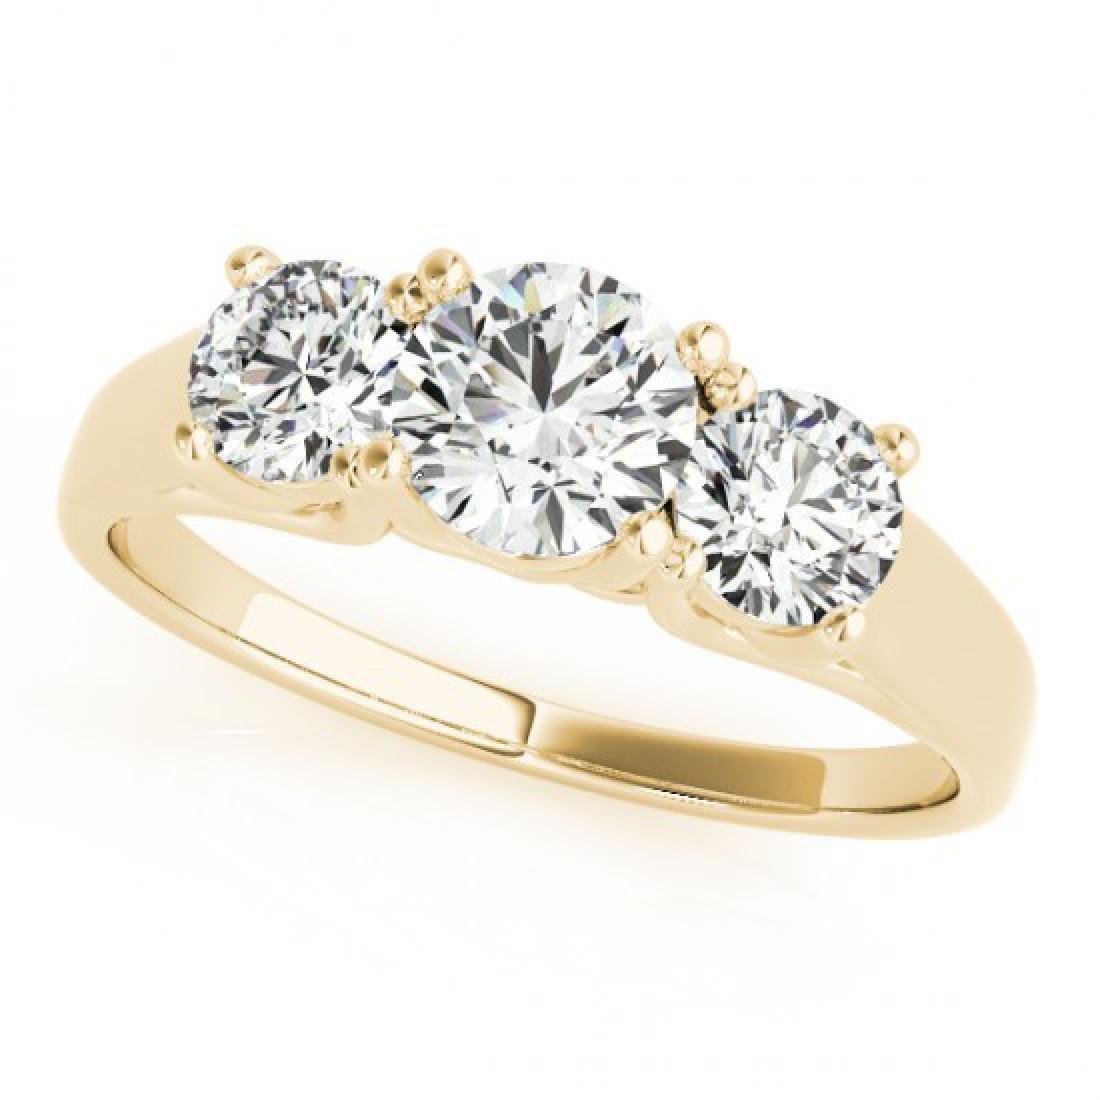 1.3 CTW Certified VS/SI Diamond 3 Stone Ring 14K Yellow